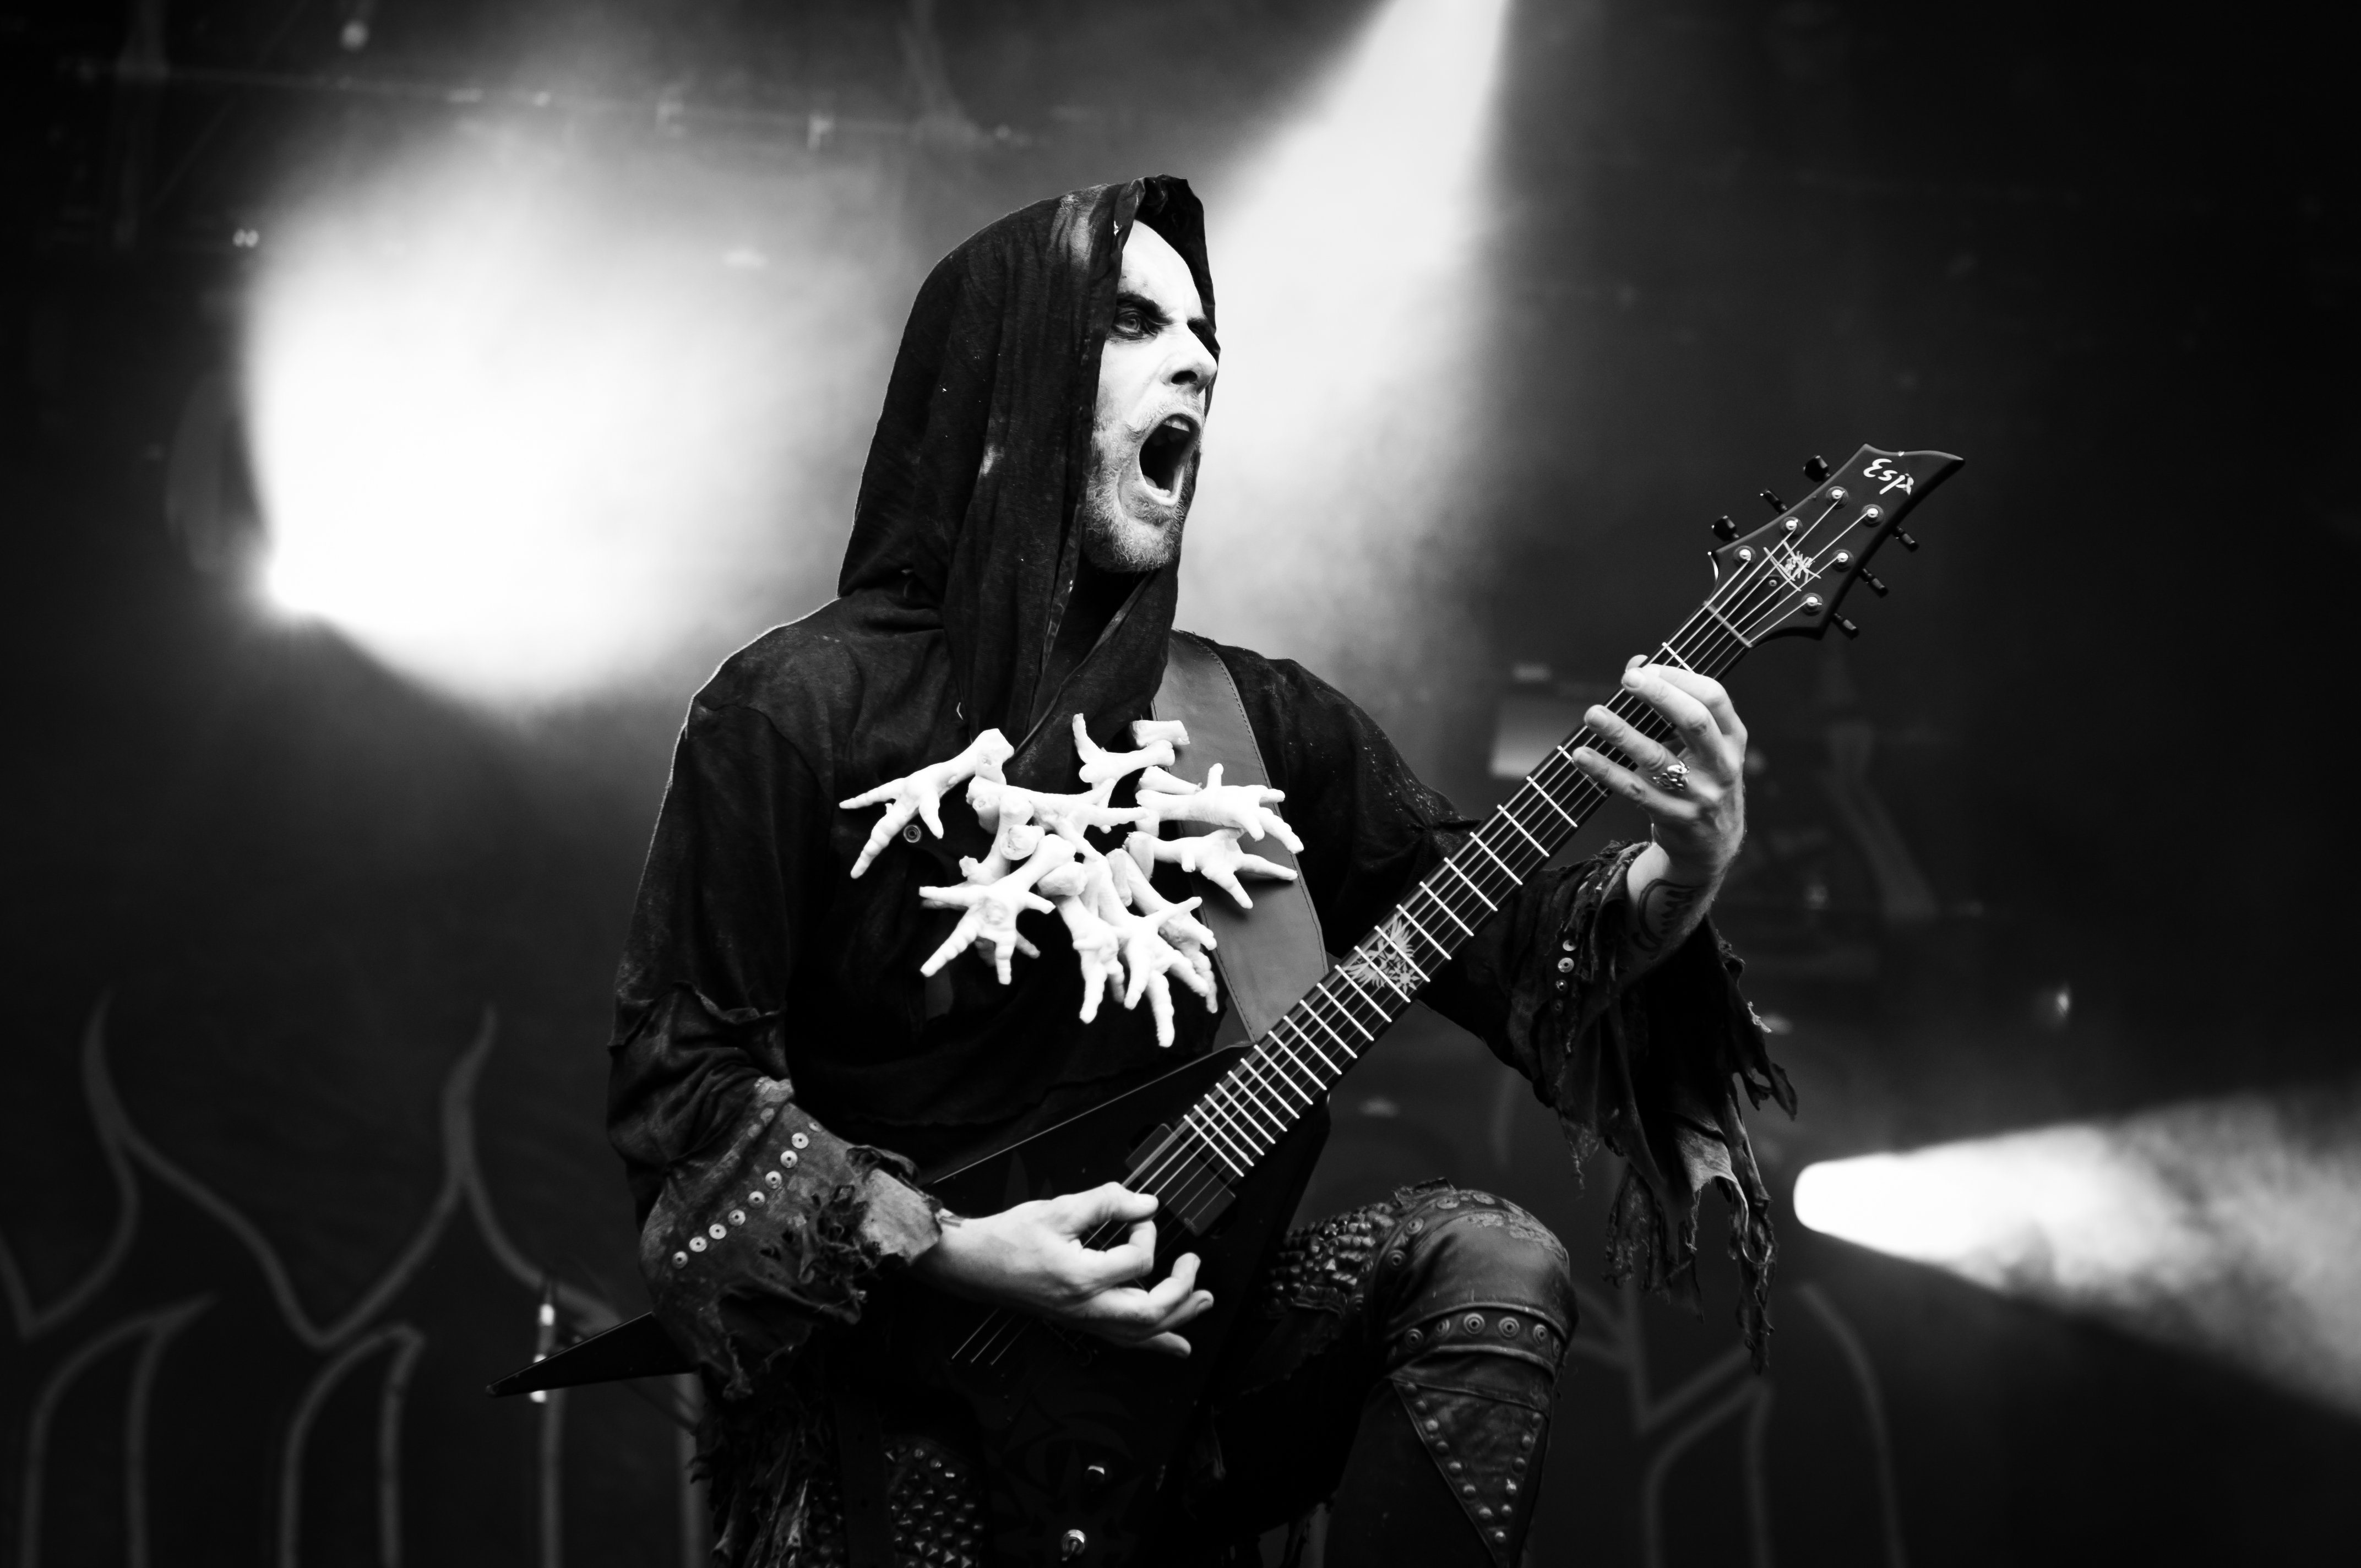 Behemoth black metal heavy 18 wallpaper 4288x2848 - Black metal wallpaper ...